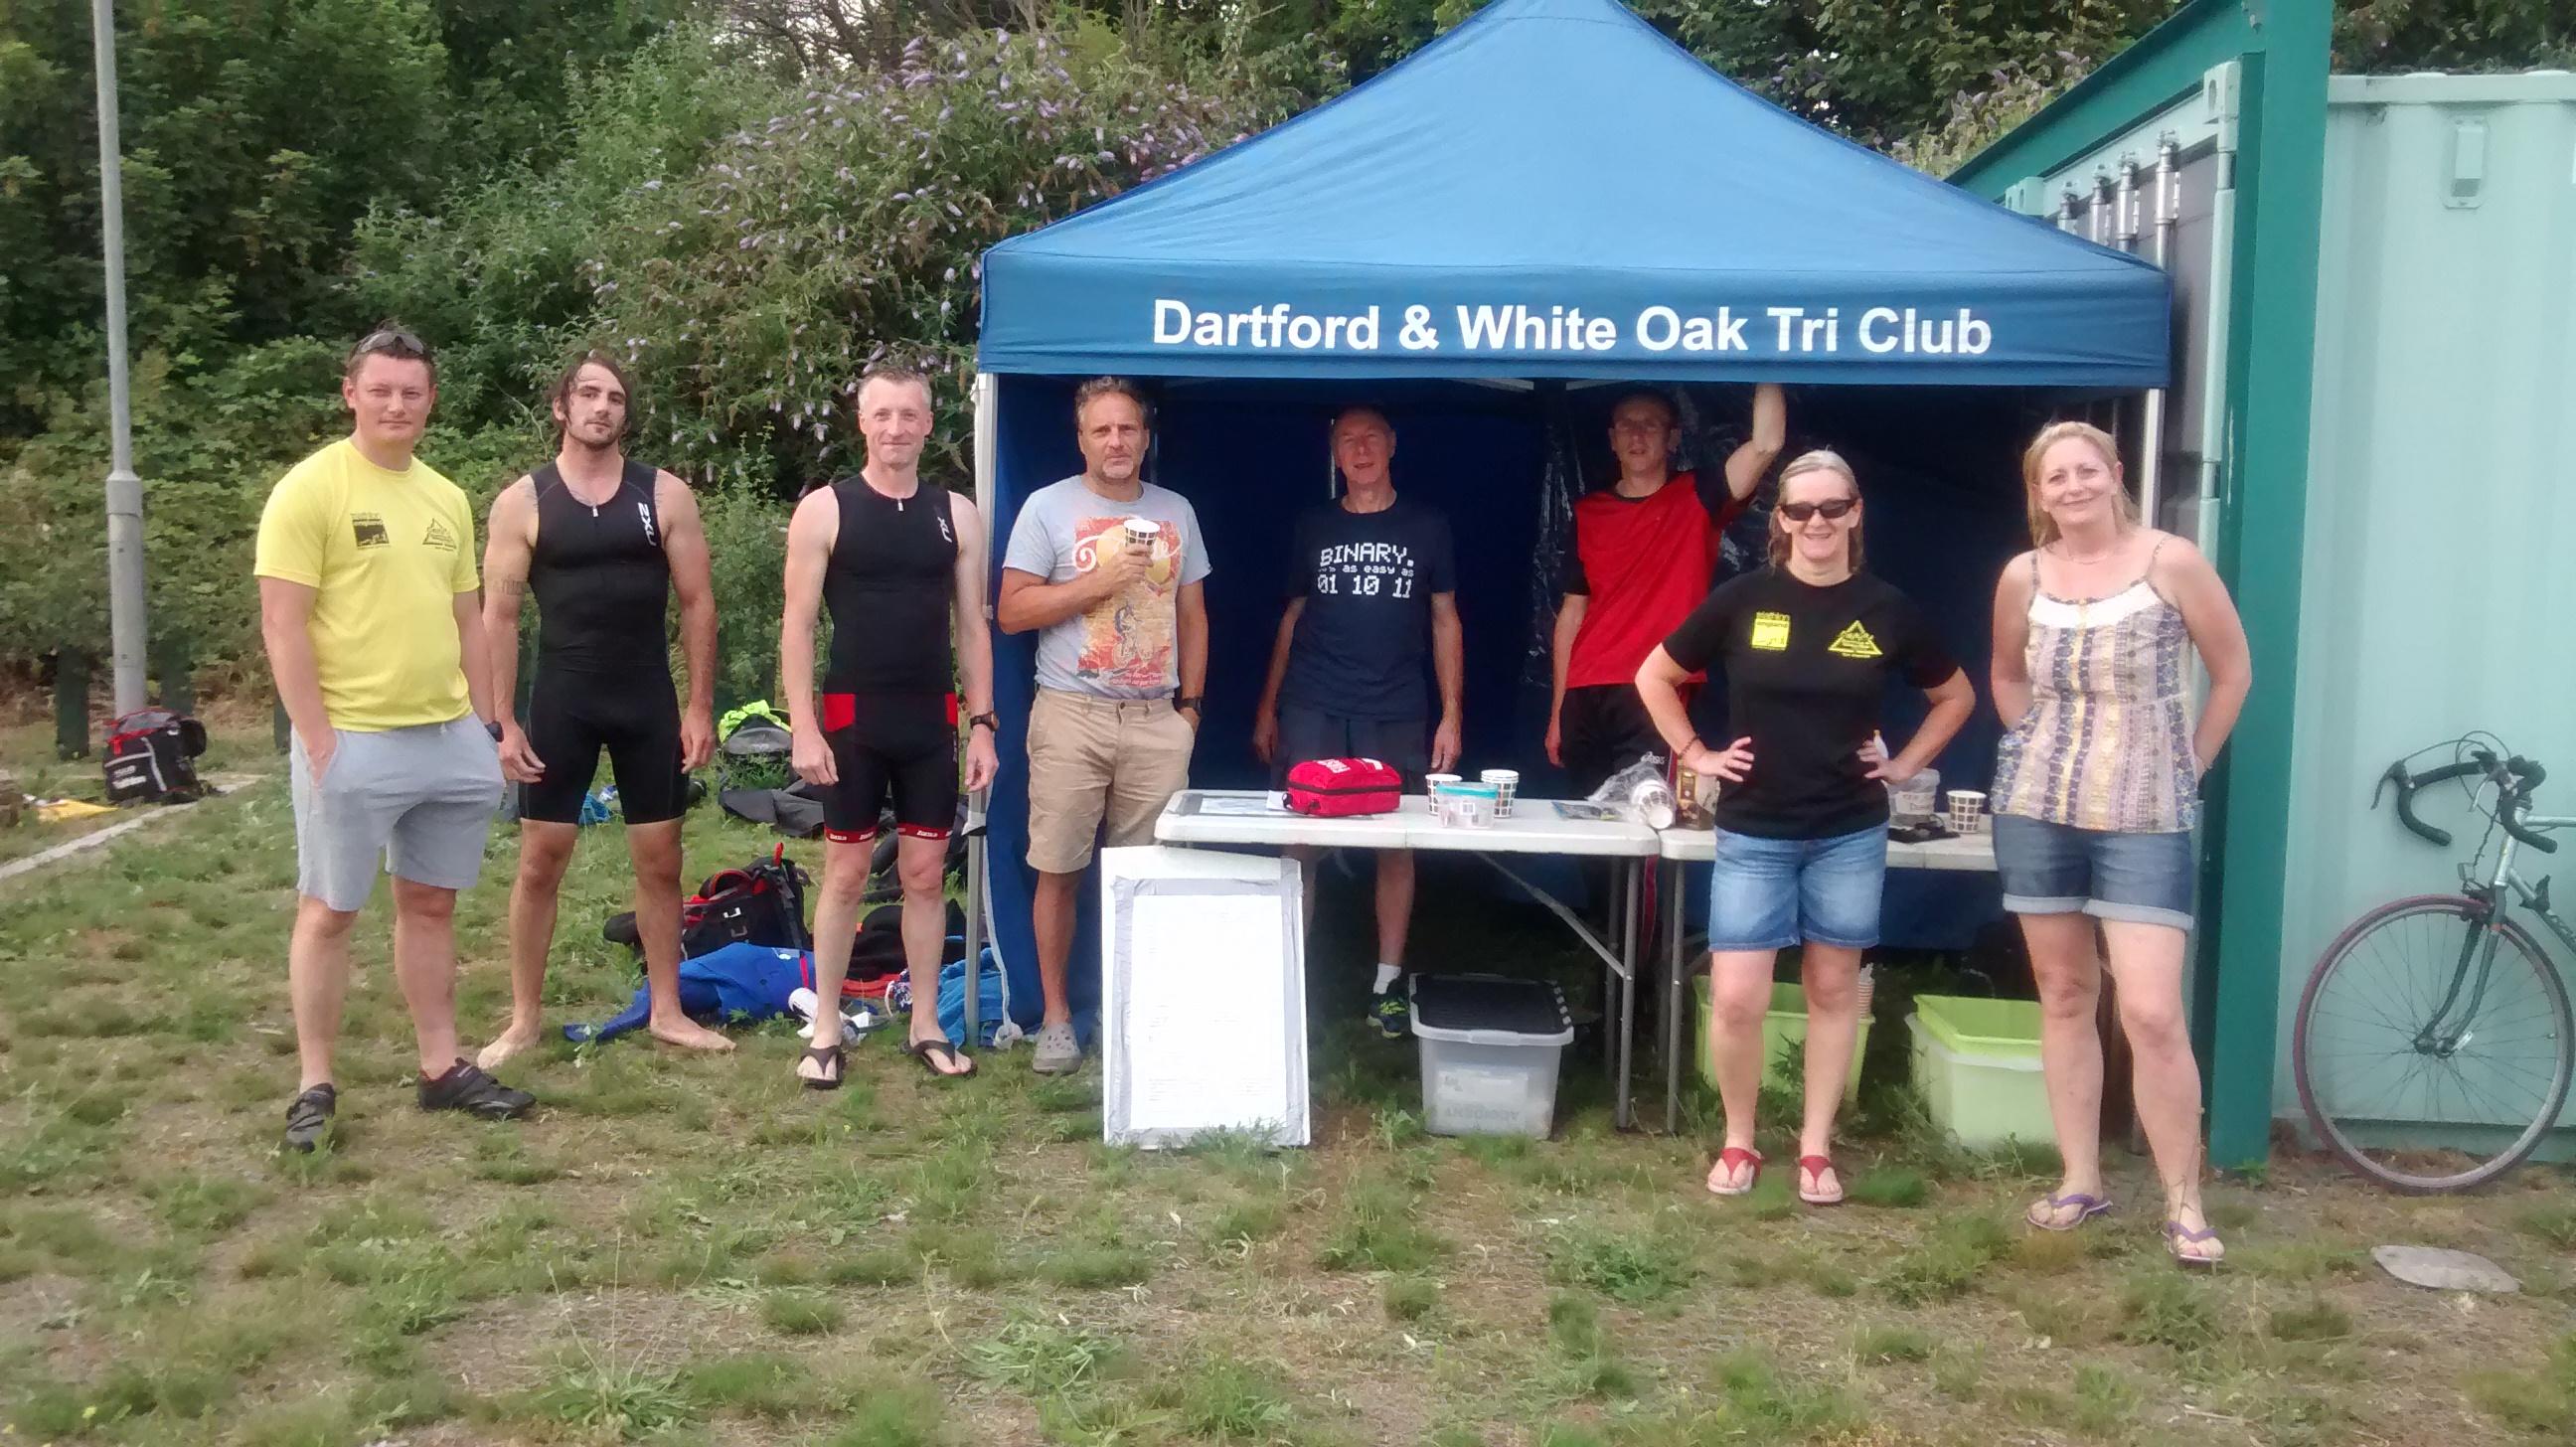 Lake Swimming Now Open For 2017 Dartford And White Oak Triathlon Club